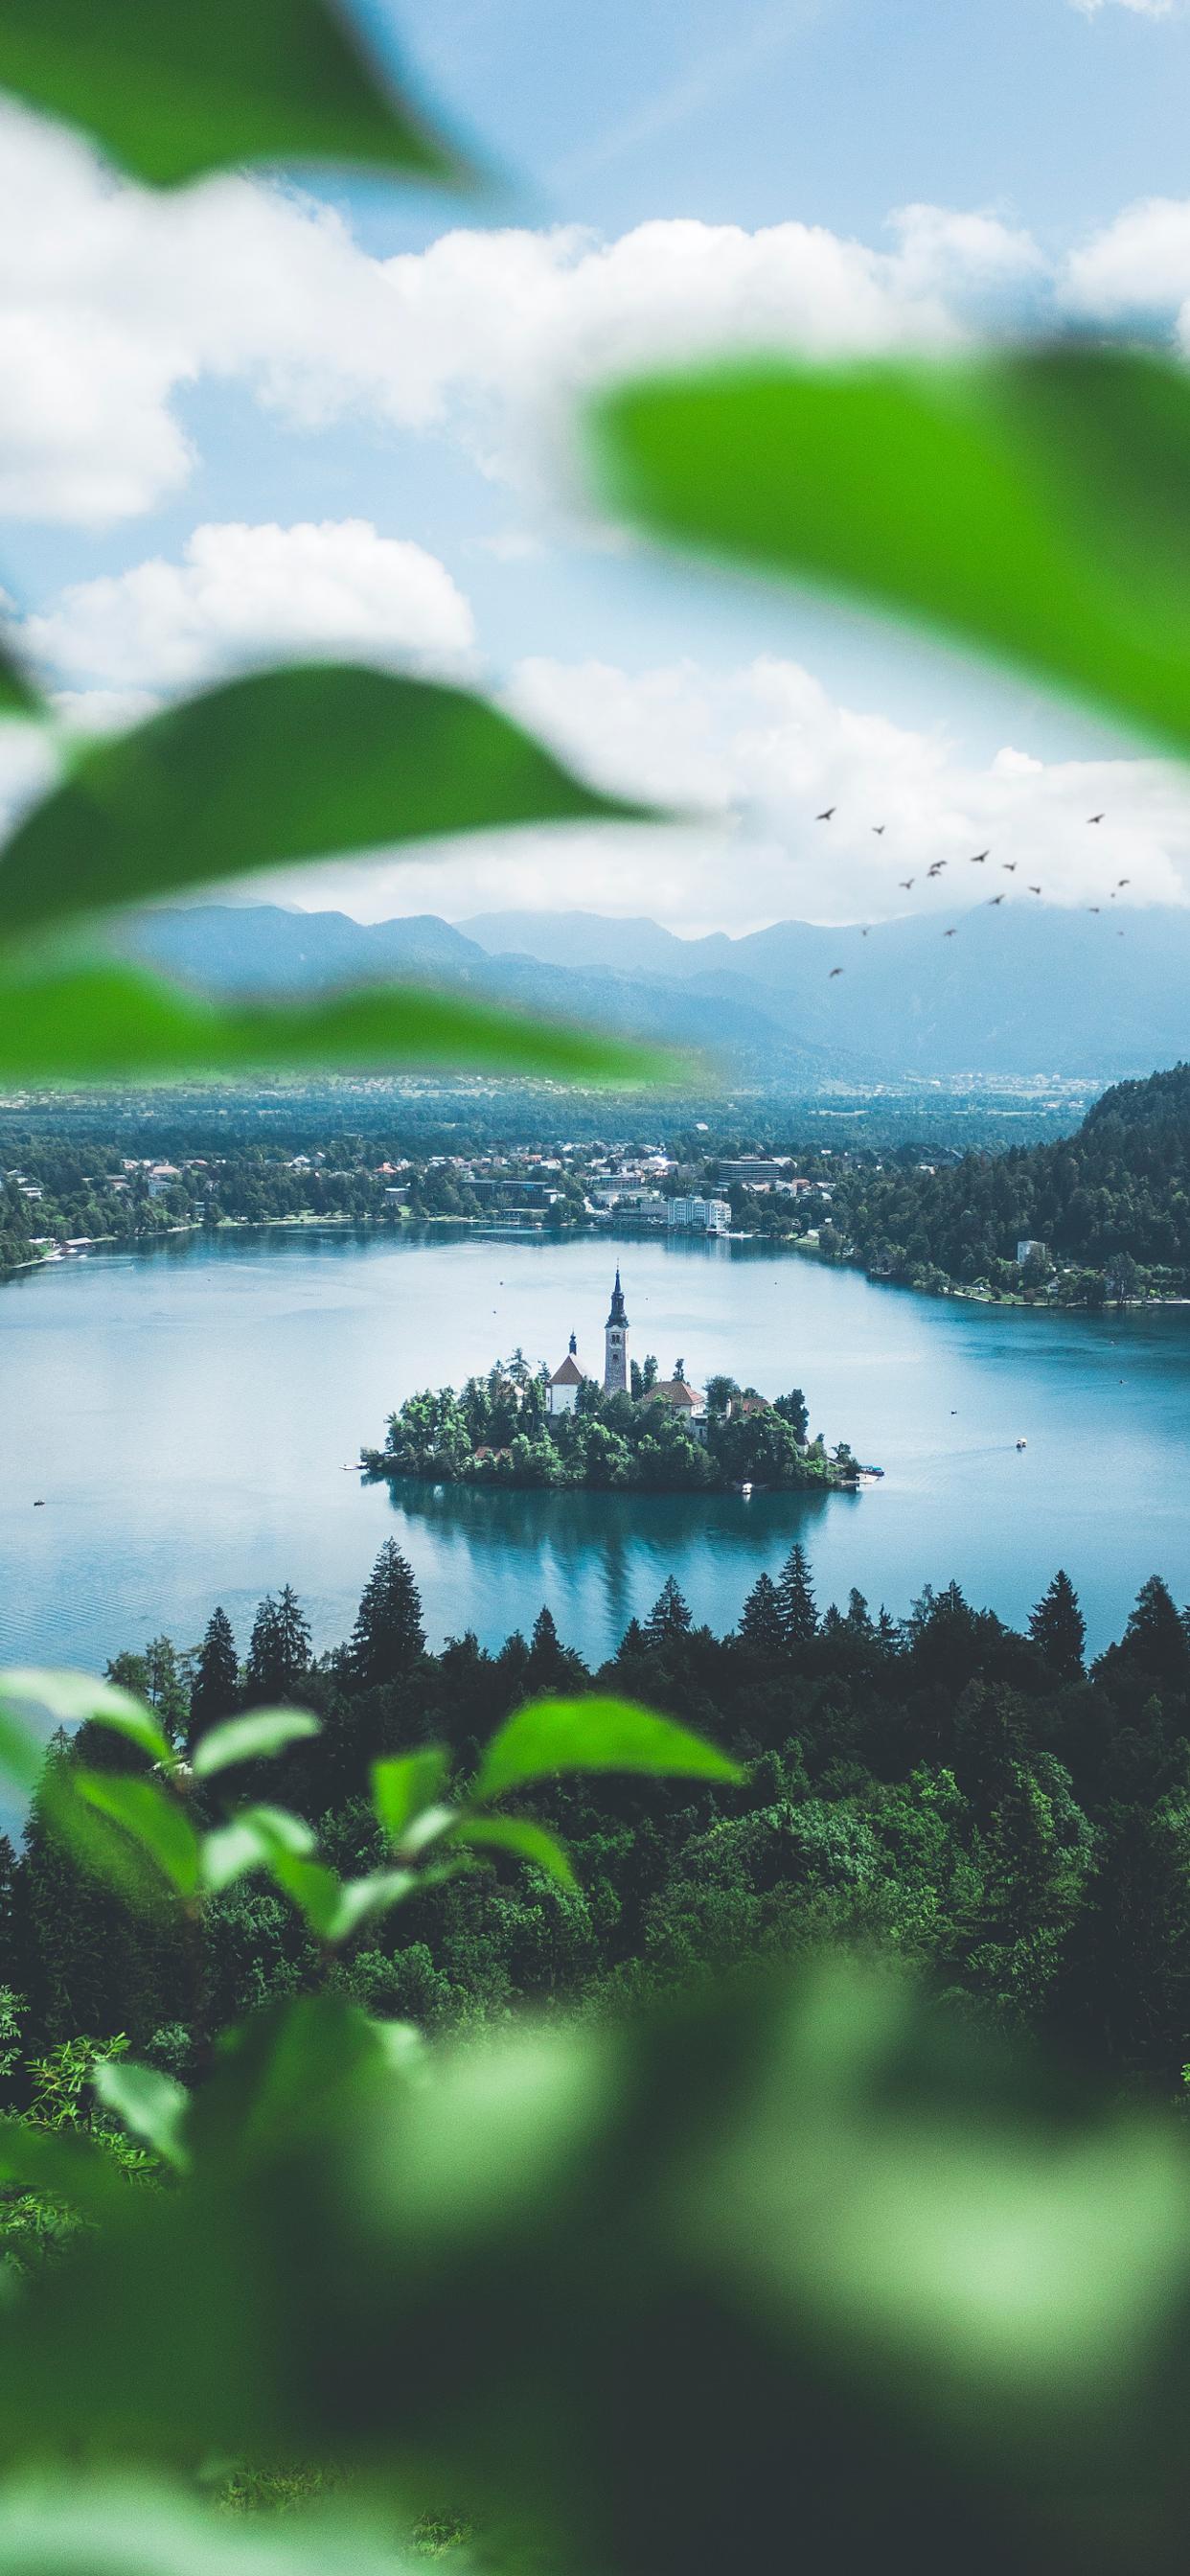 iPhone wallpapers lake bled slovenia Fonds d'écran iPhone du 30/08/2019